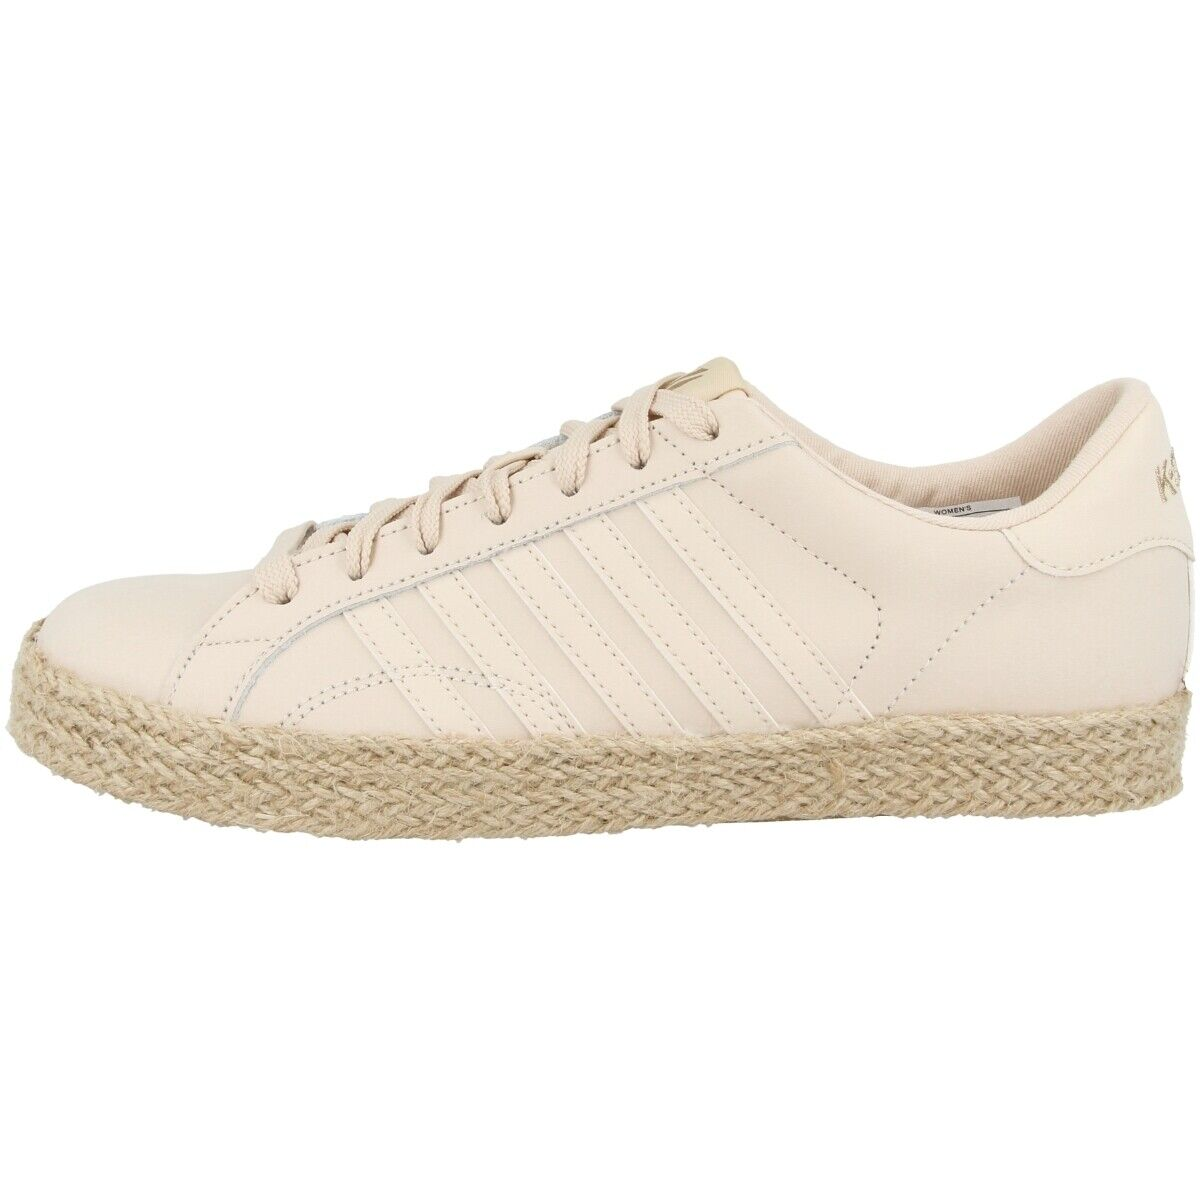 K-swiss belmont os jute shoes ladies leisure shoe sneaker arena 96139-270